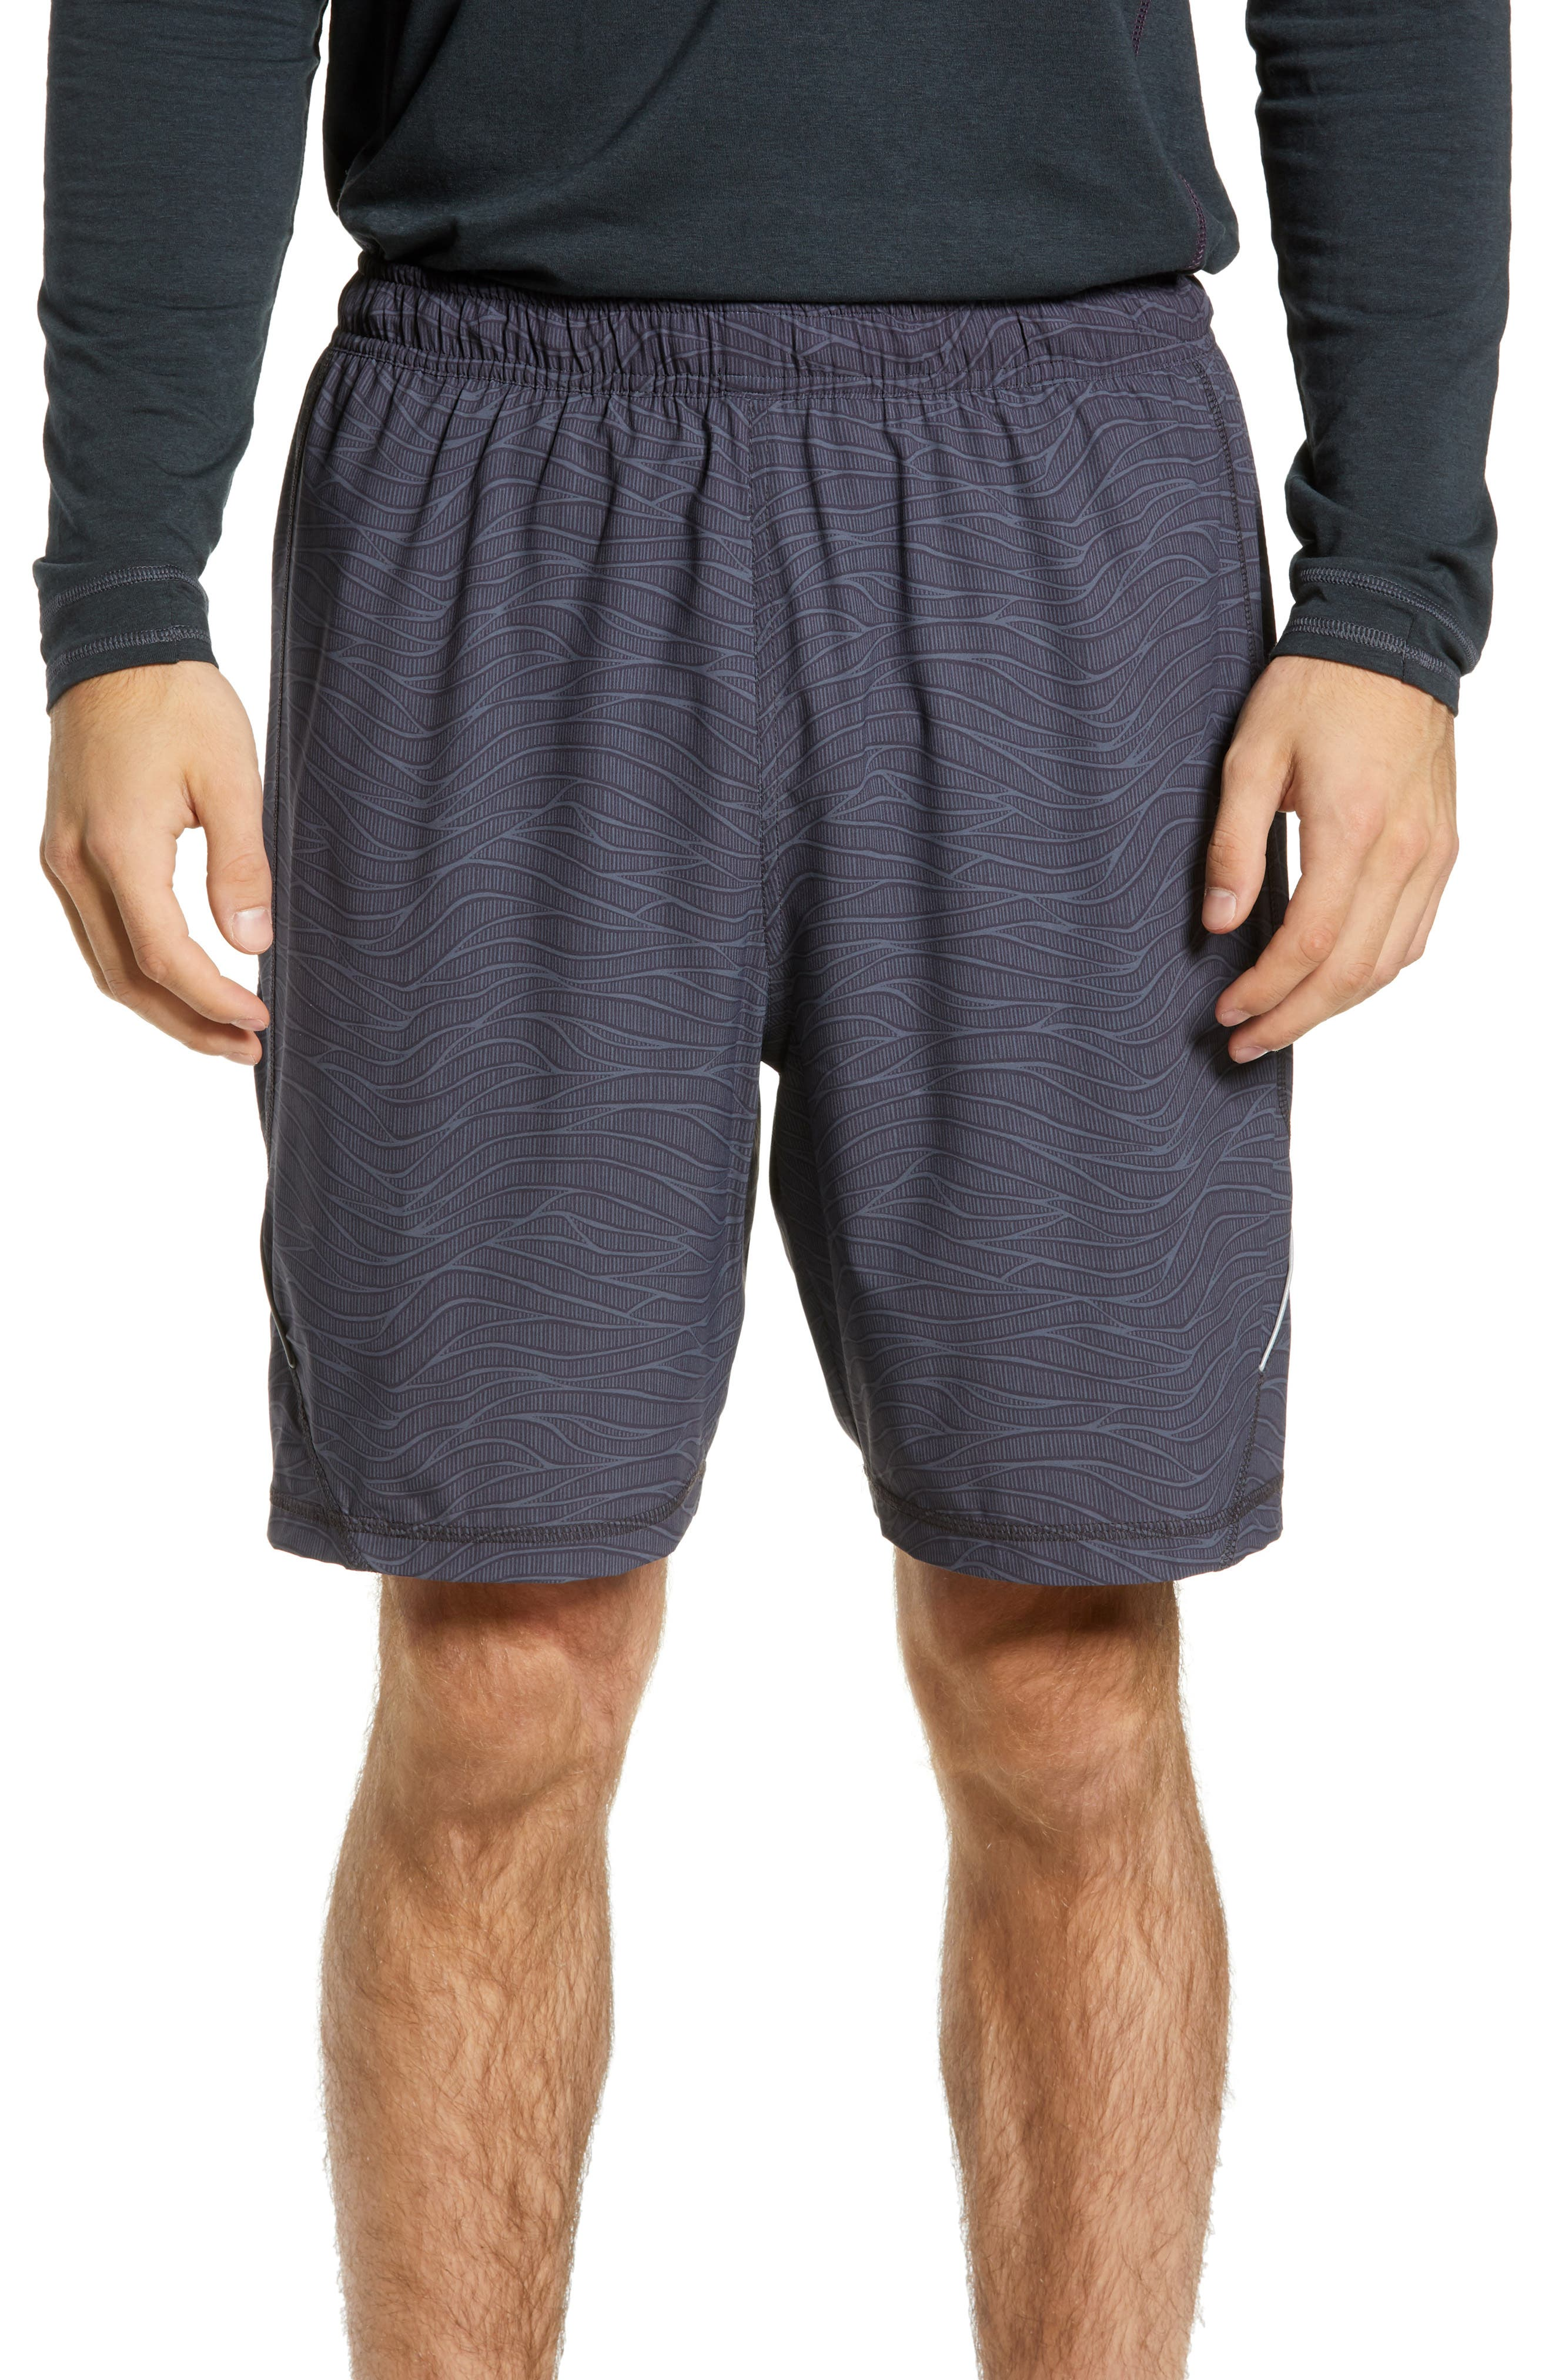 TASC PERFORMANCE, Propulsion Athletic Shorts, Main thumbnail 1, color, BLACK SONIC WAVE